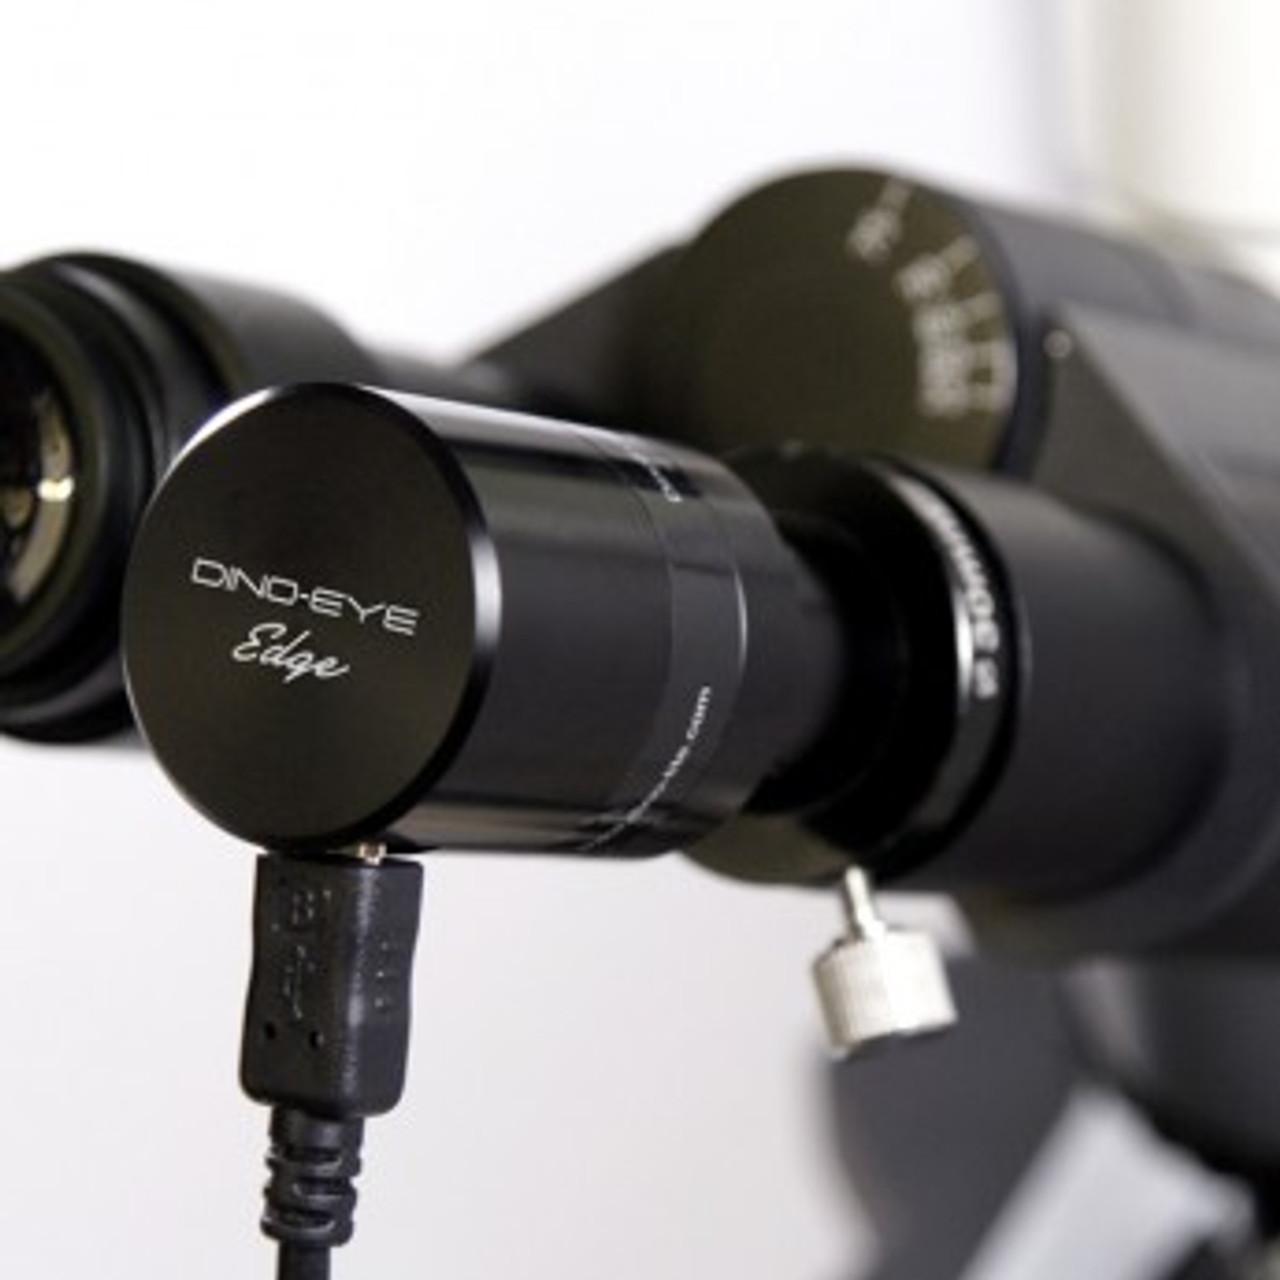 AM4025X Dino-Eye Edge Eyepiece Camera